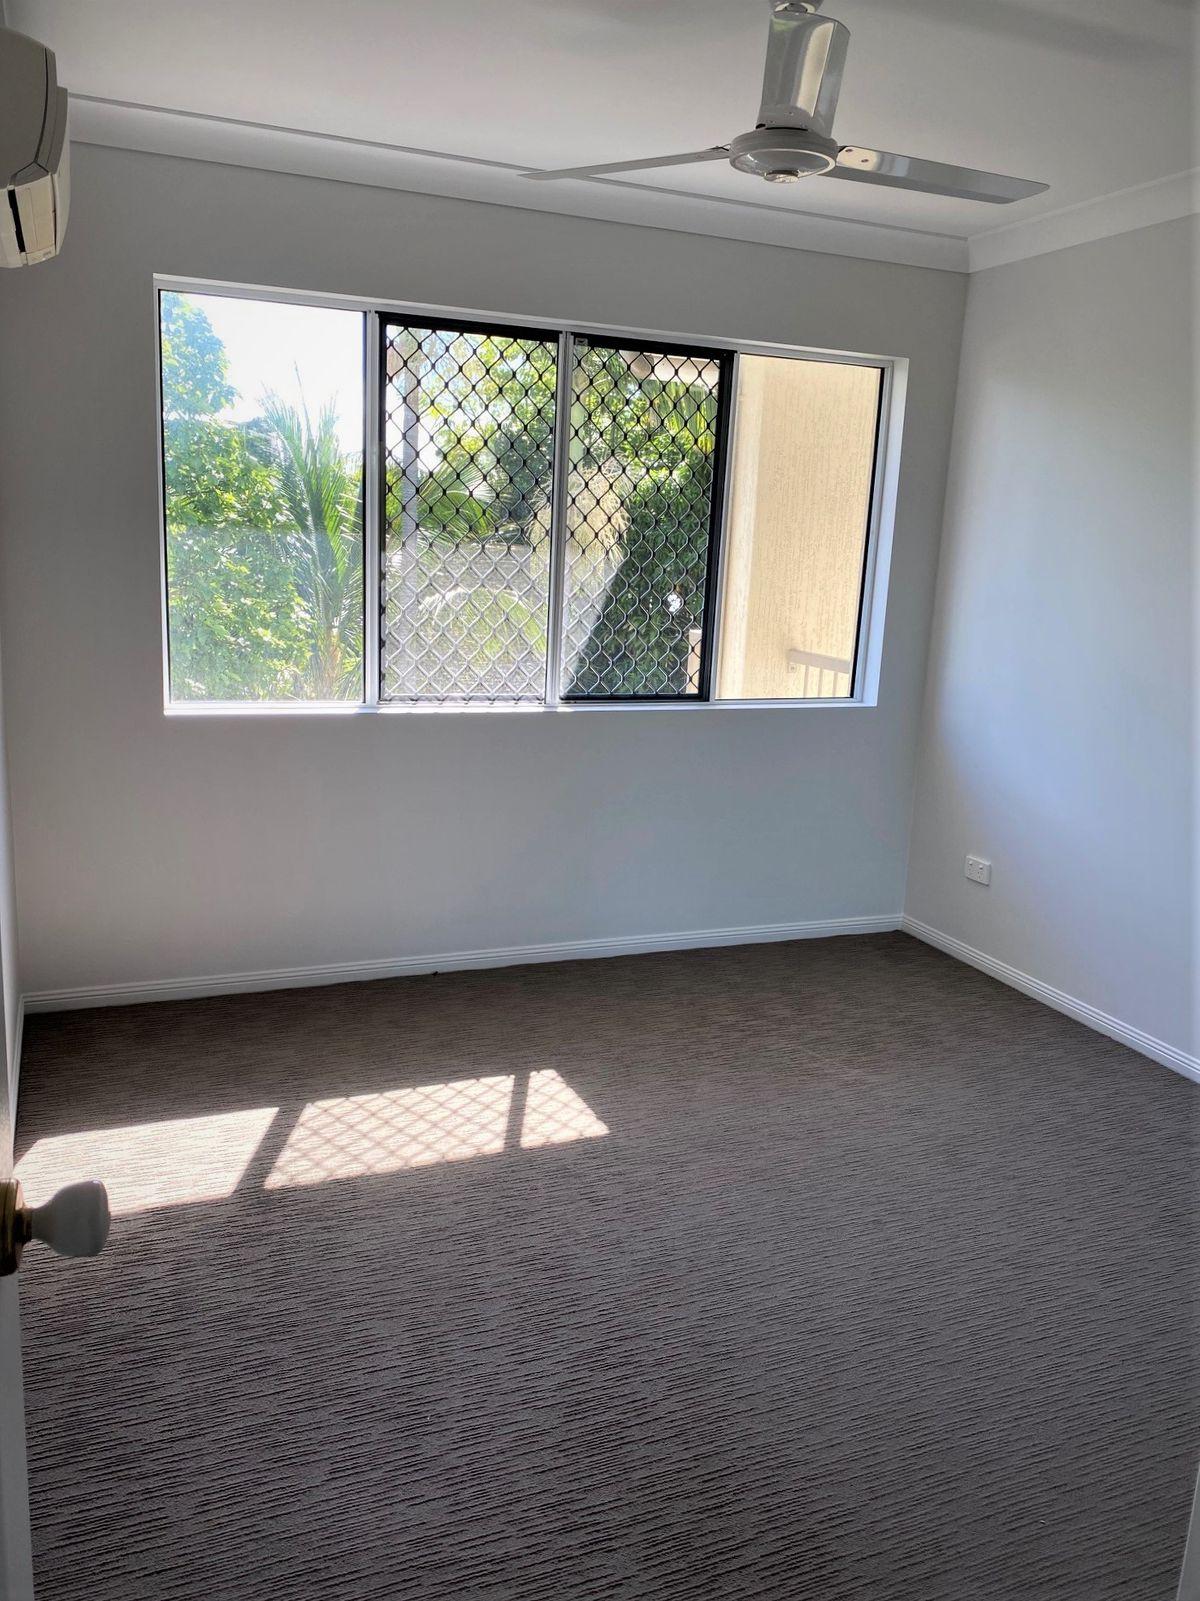 10/11 Bridge Road, East Mackay, QLD 4740